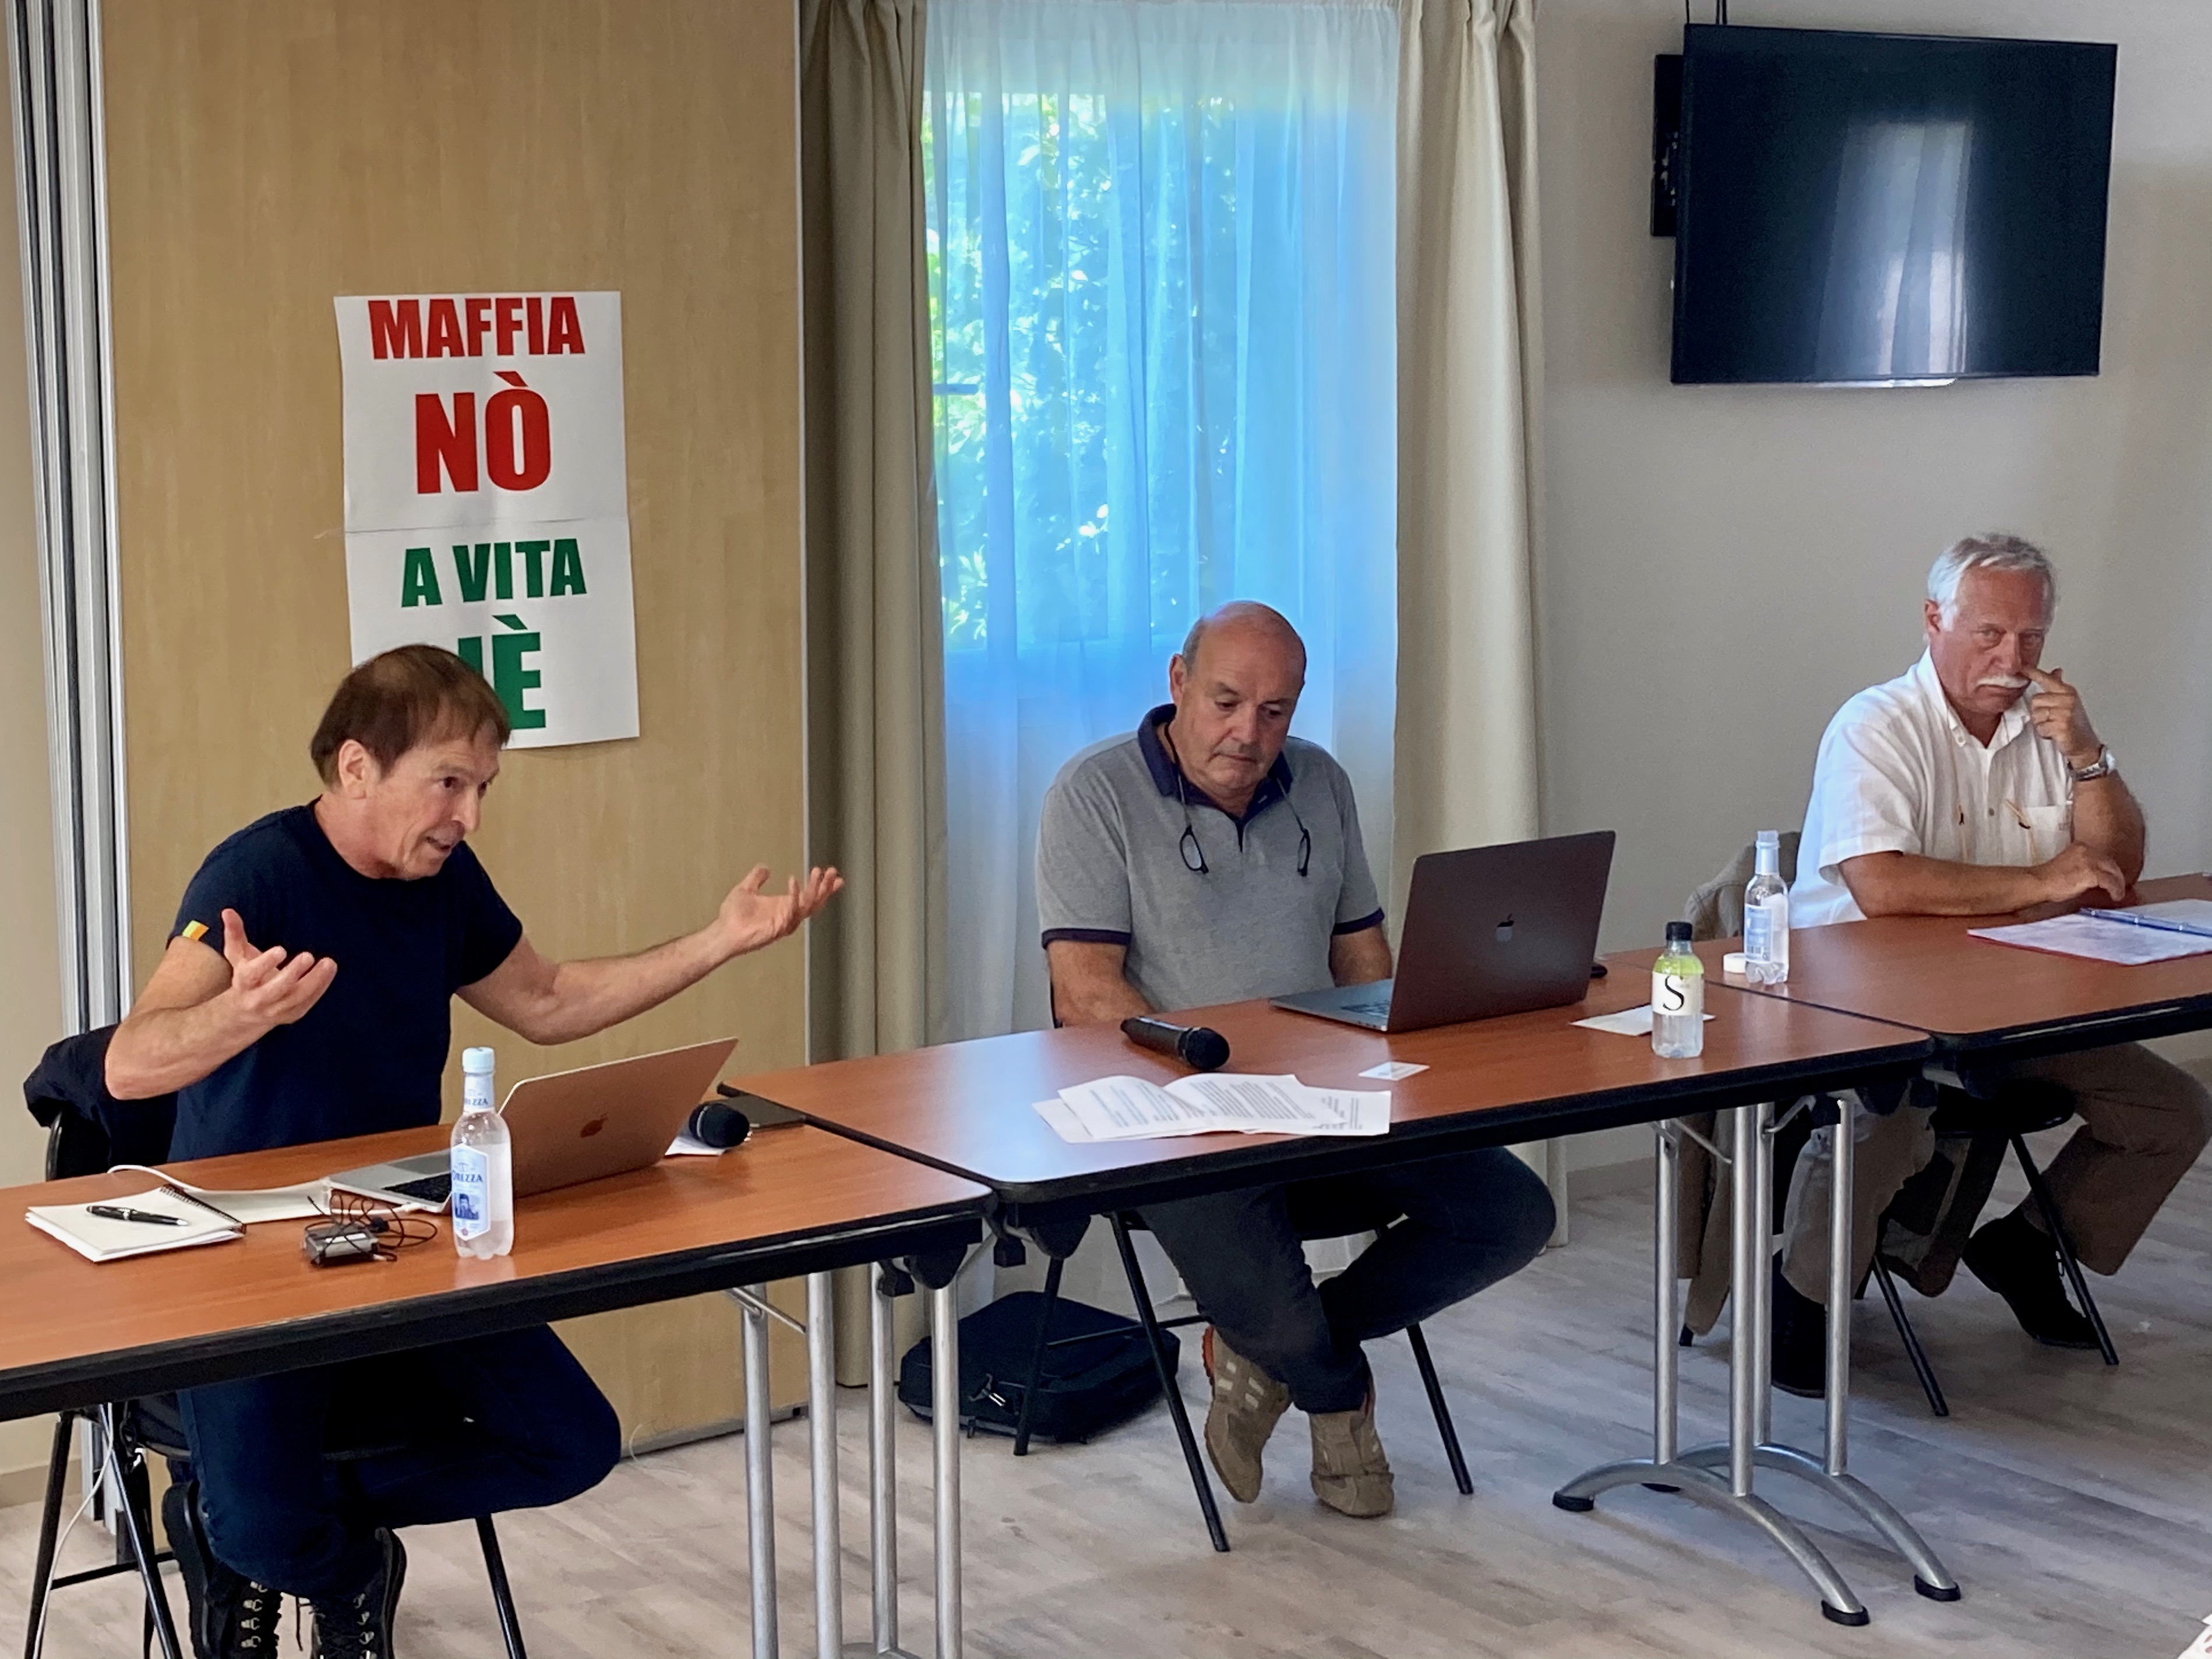 Jean-Francois Bernardini, Léo Battesti et Ernest Centofanti, du collectif «A maffia no, a vita iè»